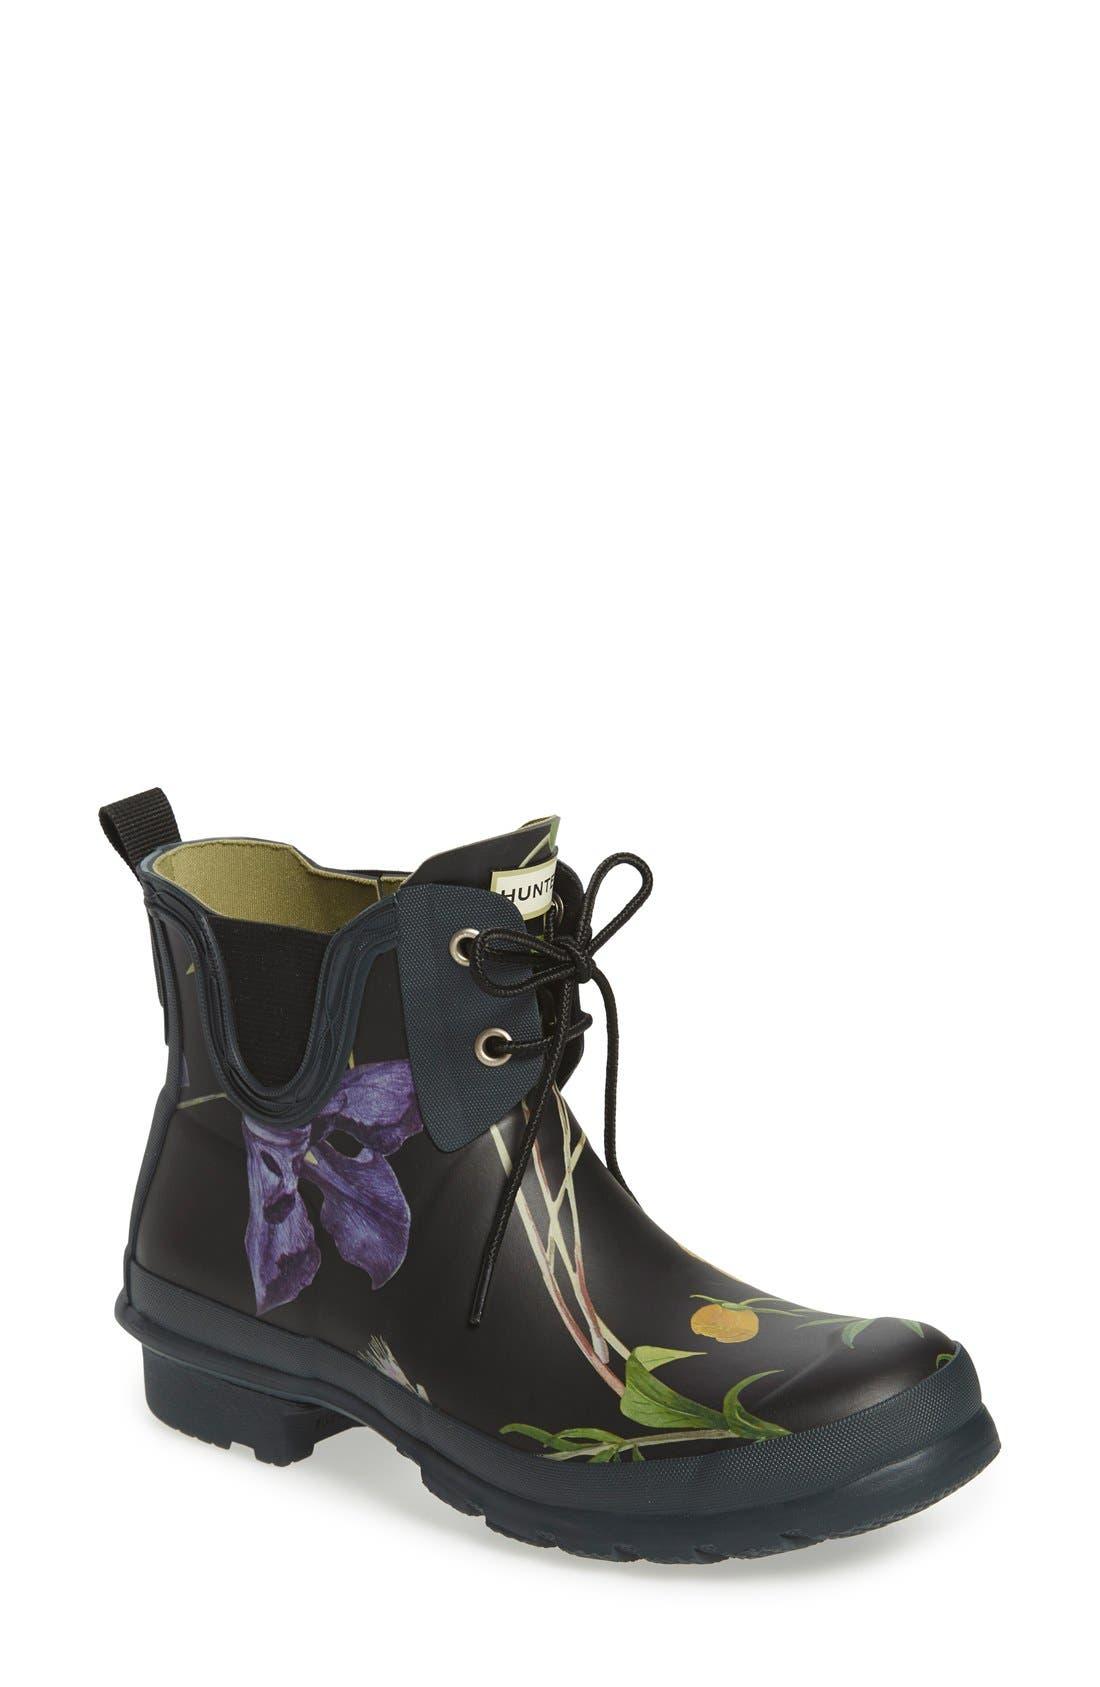 Alternate Image 1 Selected - Hunter 'Royal Horticultural Society' Waterproof Lace-Up Short Rain Boot (Women)